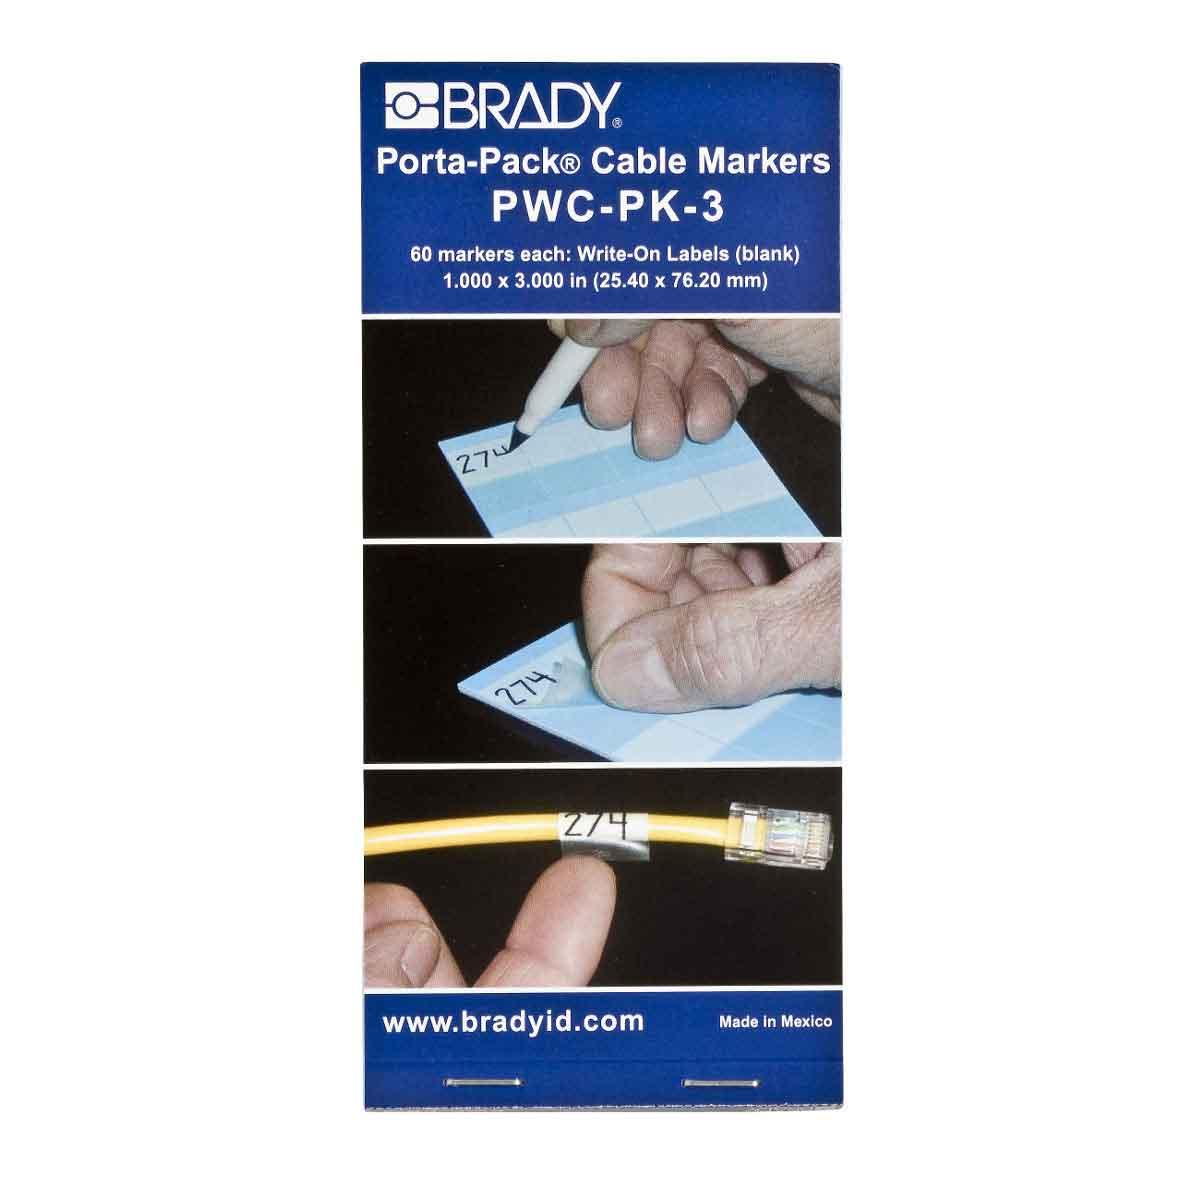 BRADY PWC-PK-3 WRITE-ON CBL MARKER